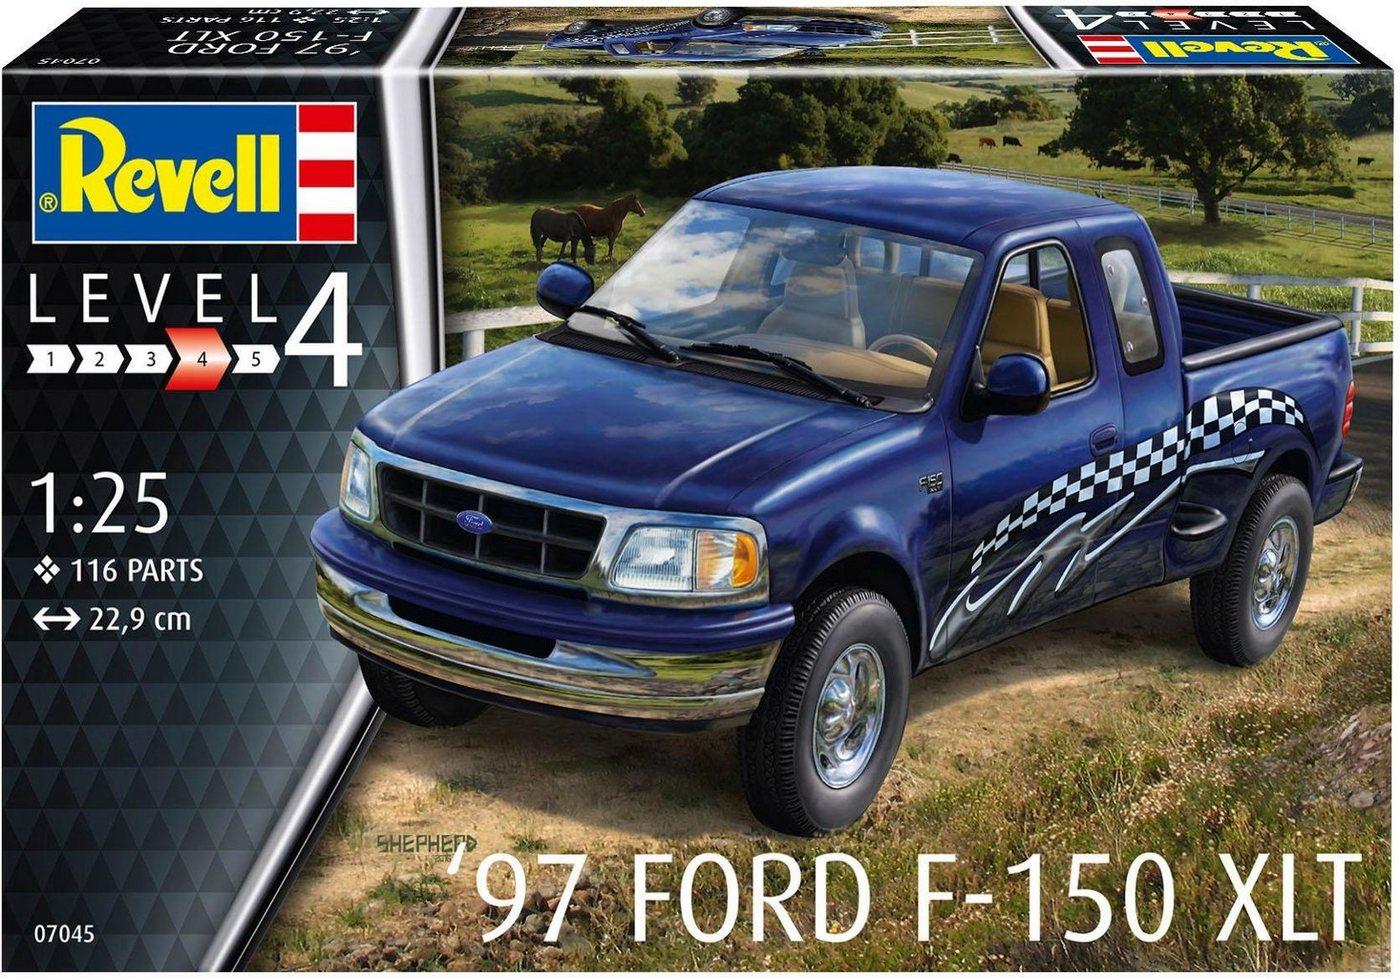 Revell Modellbausatz Auto, Maßstab 1:25, »97 Ford F-150 XLT«